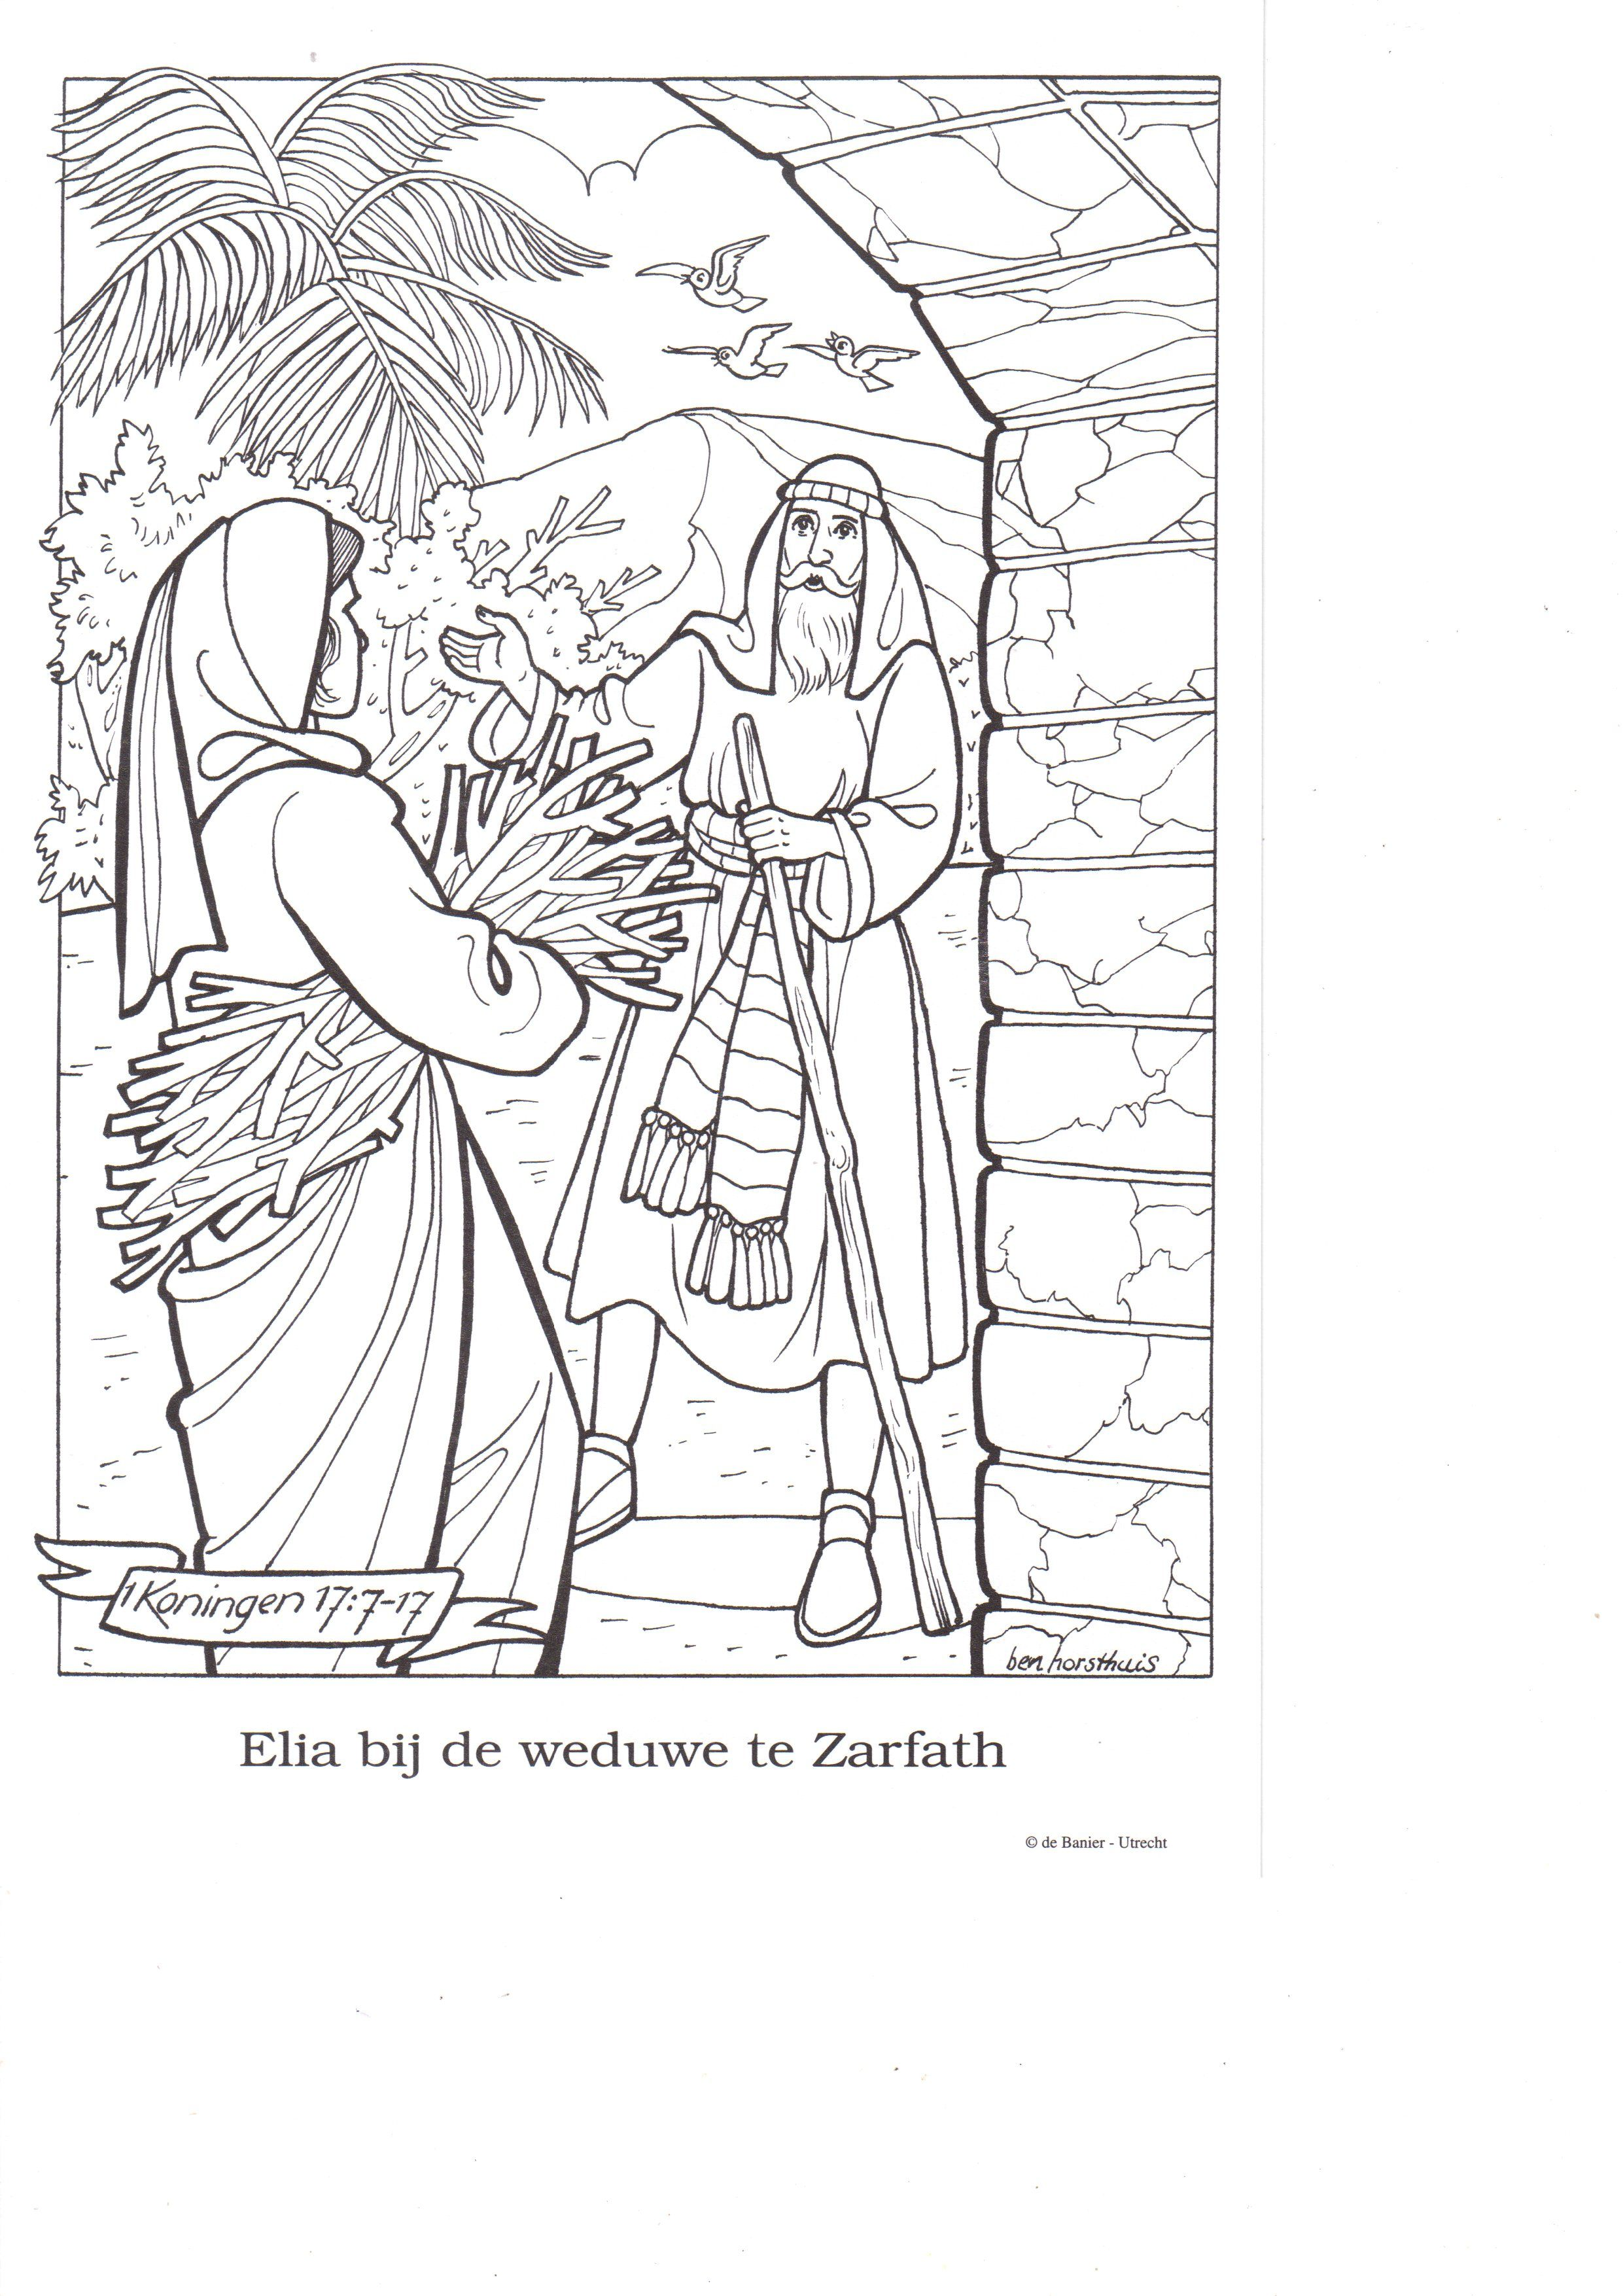 Elijah And The Widow Of Zarapheth Elijah And The Widow Bible Coloring Pages Coloring Pages